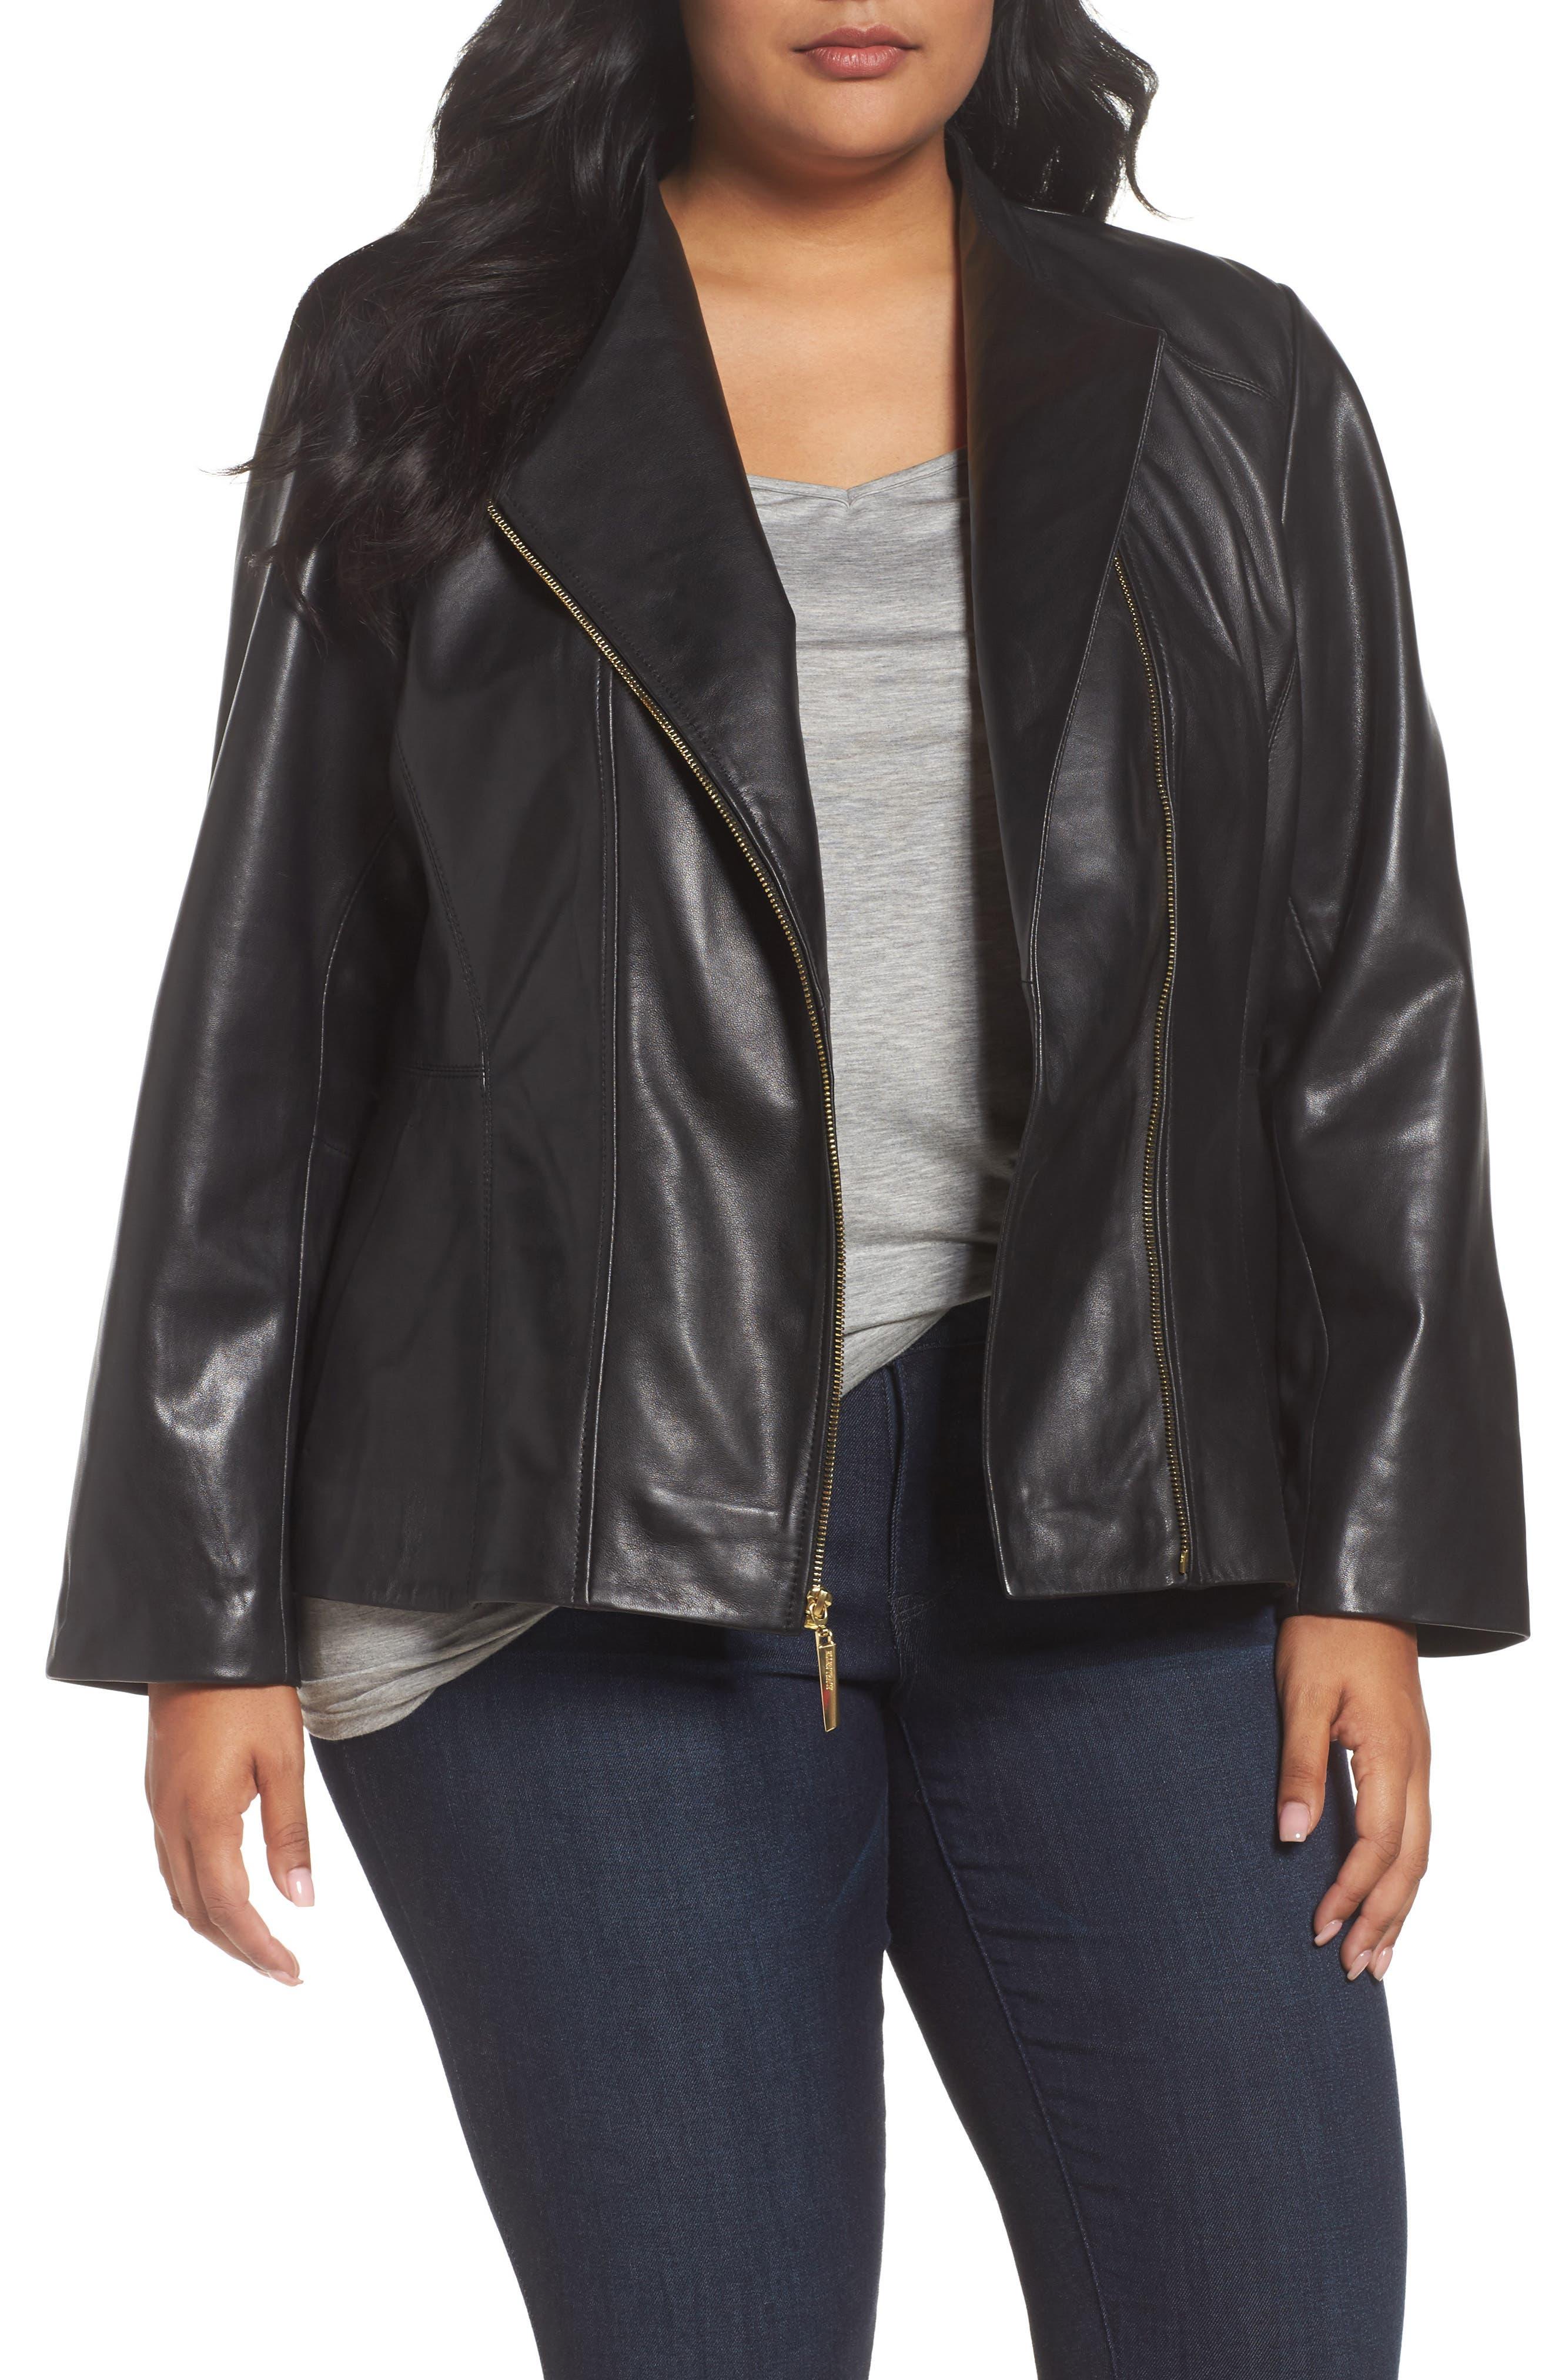 Main Image - Ellen Tracy Asymmetrical Zip Leather Jacket (Plus Size)